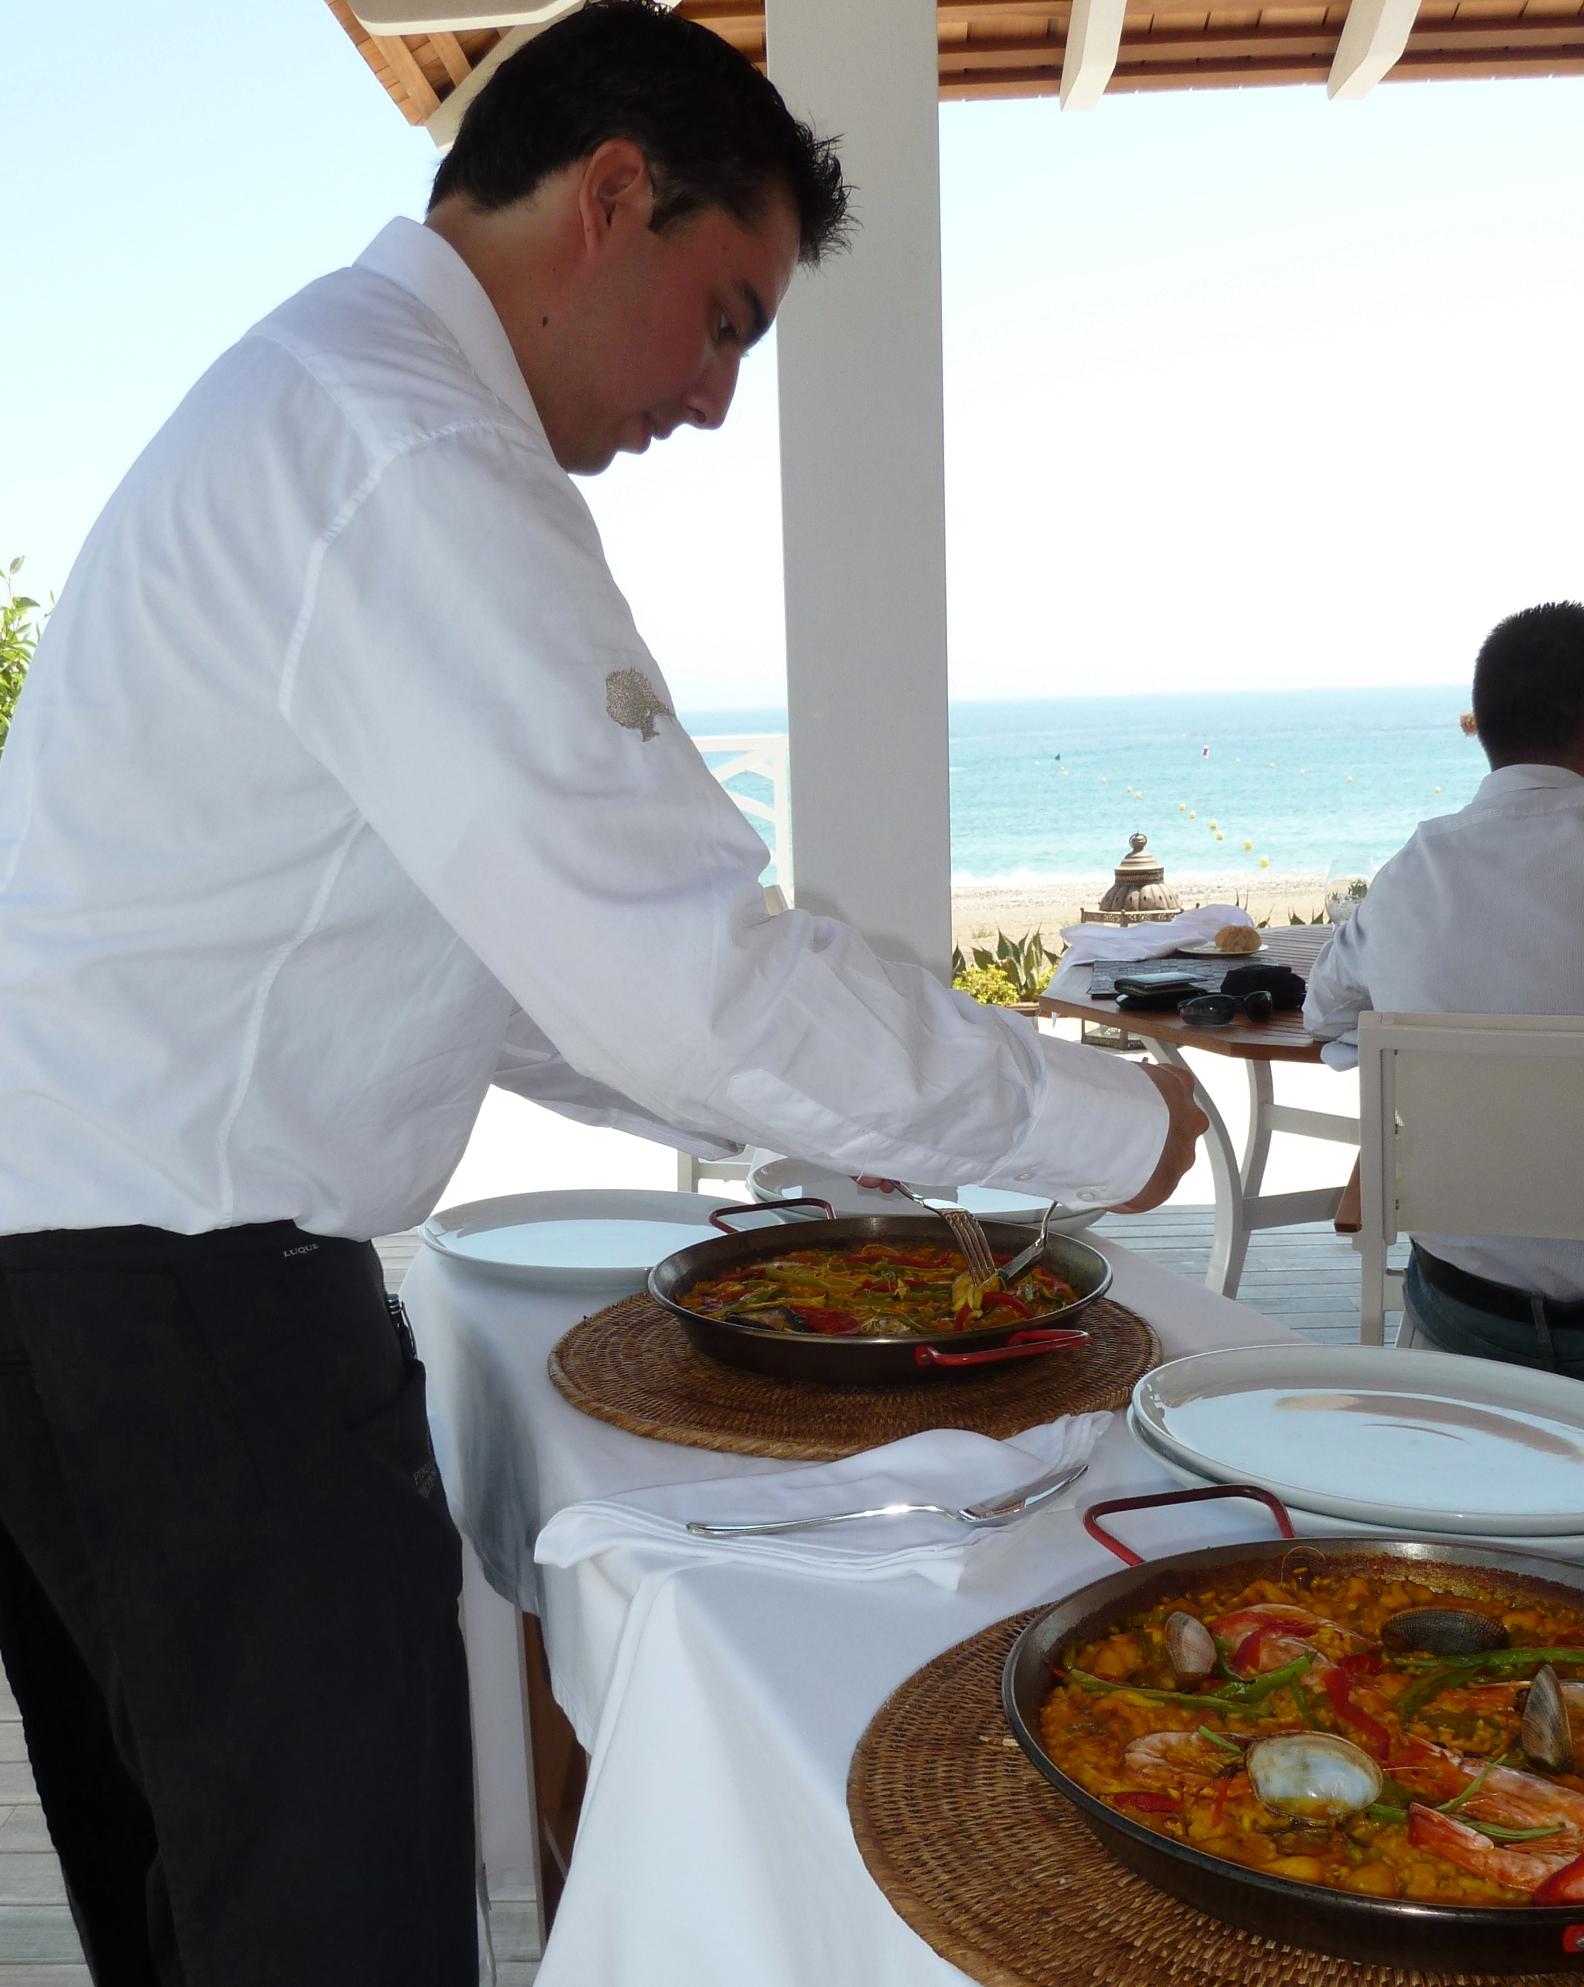 Paella_Beach_Club_Finca_Cortesin_Bahia_Casares_copyright_www.andrewforbes.com